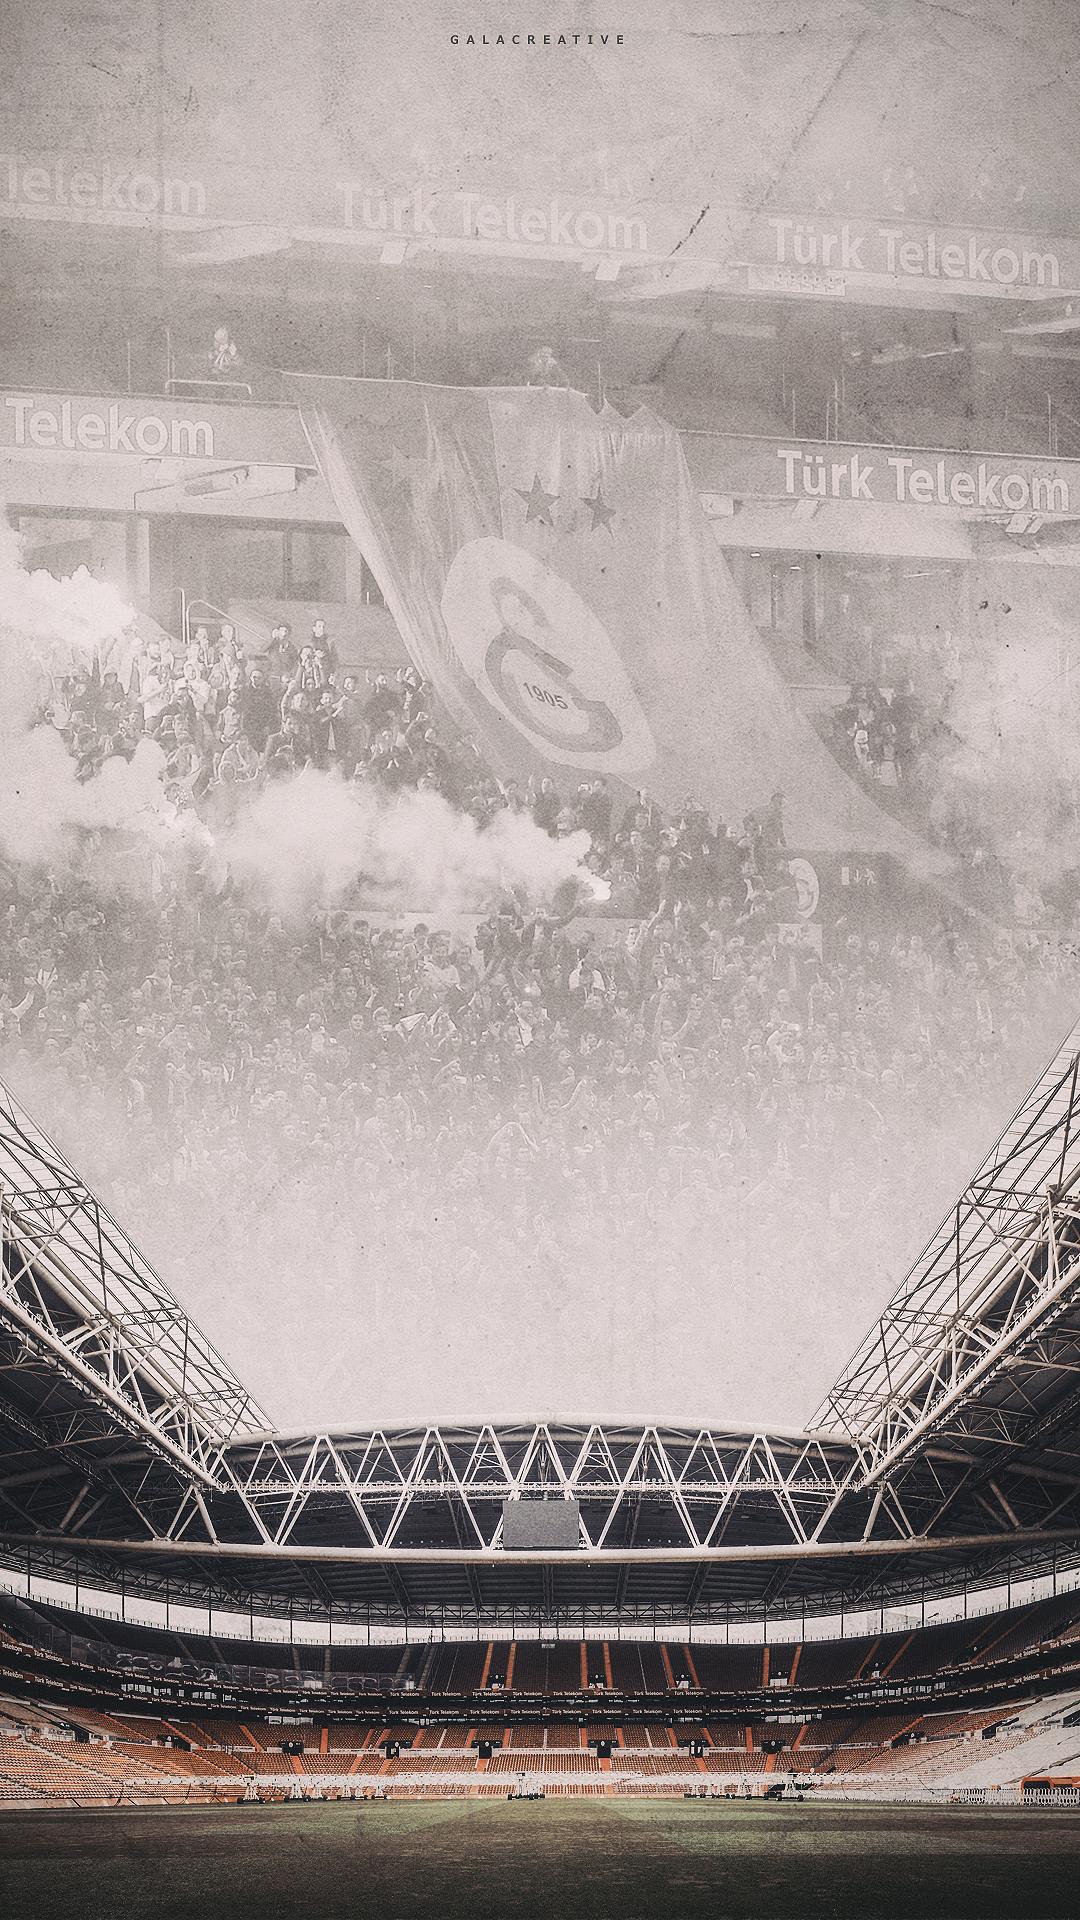 Ali Sami Yen Stadium Stadium In The Champions Naturallandmarks Hd Wallpaper Hd Wallpaper Lions In 2020 Wallpaper Hd Wallpaper Naruto Wallpaper